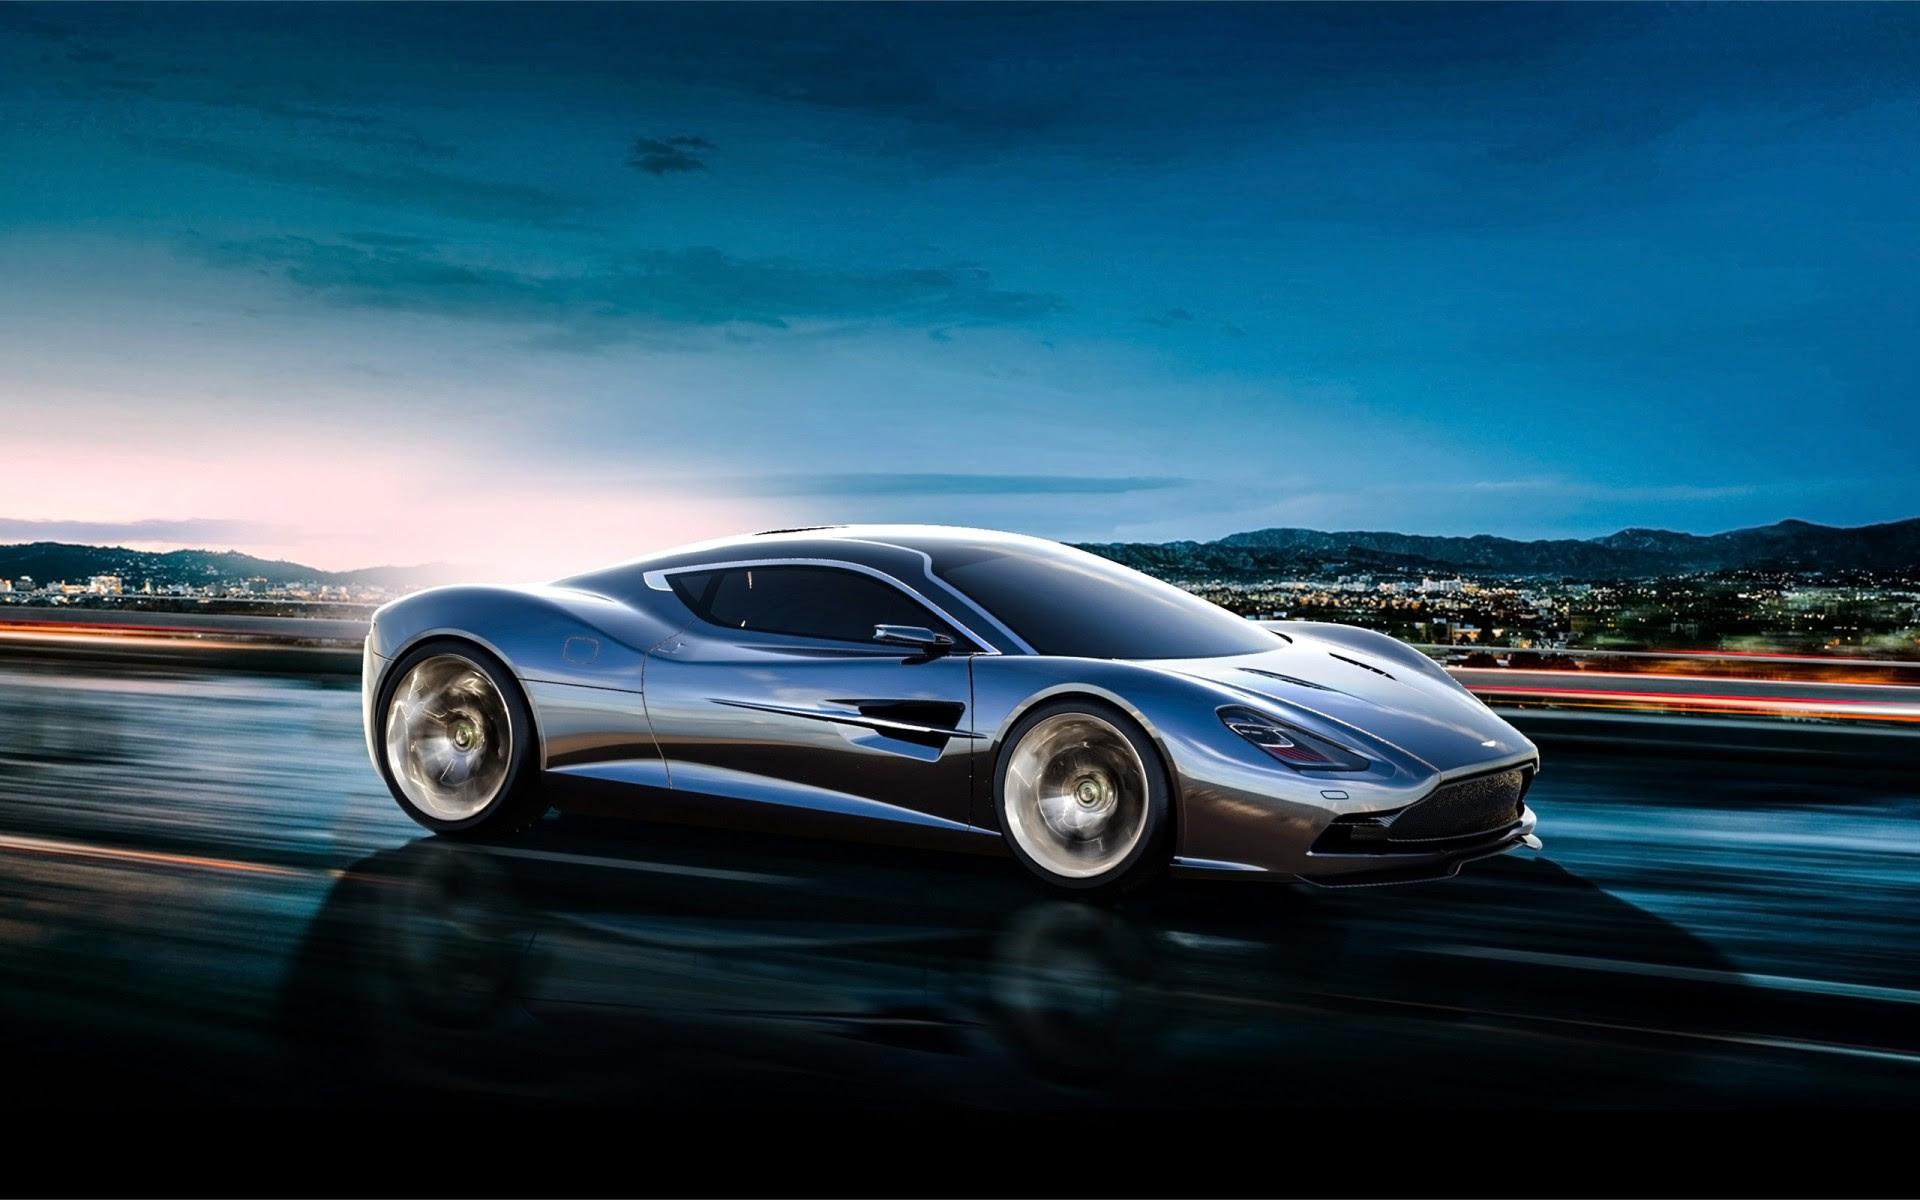 2013 Aston Martin DB